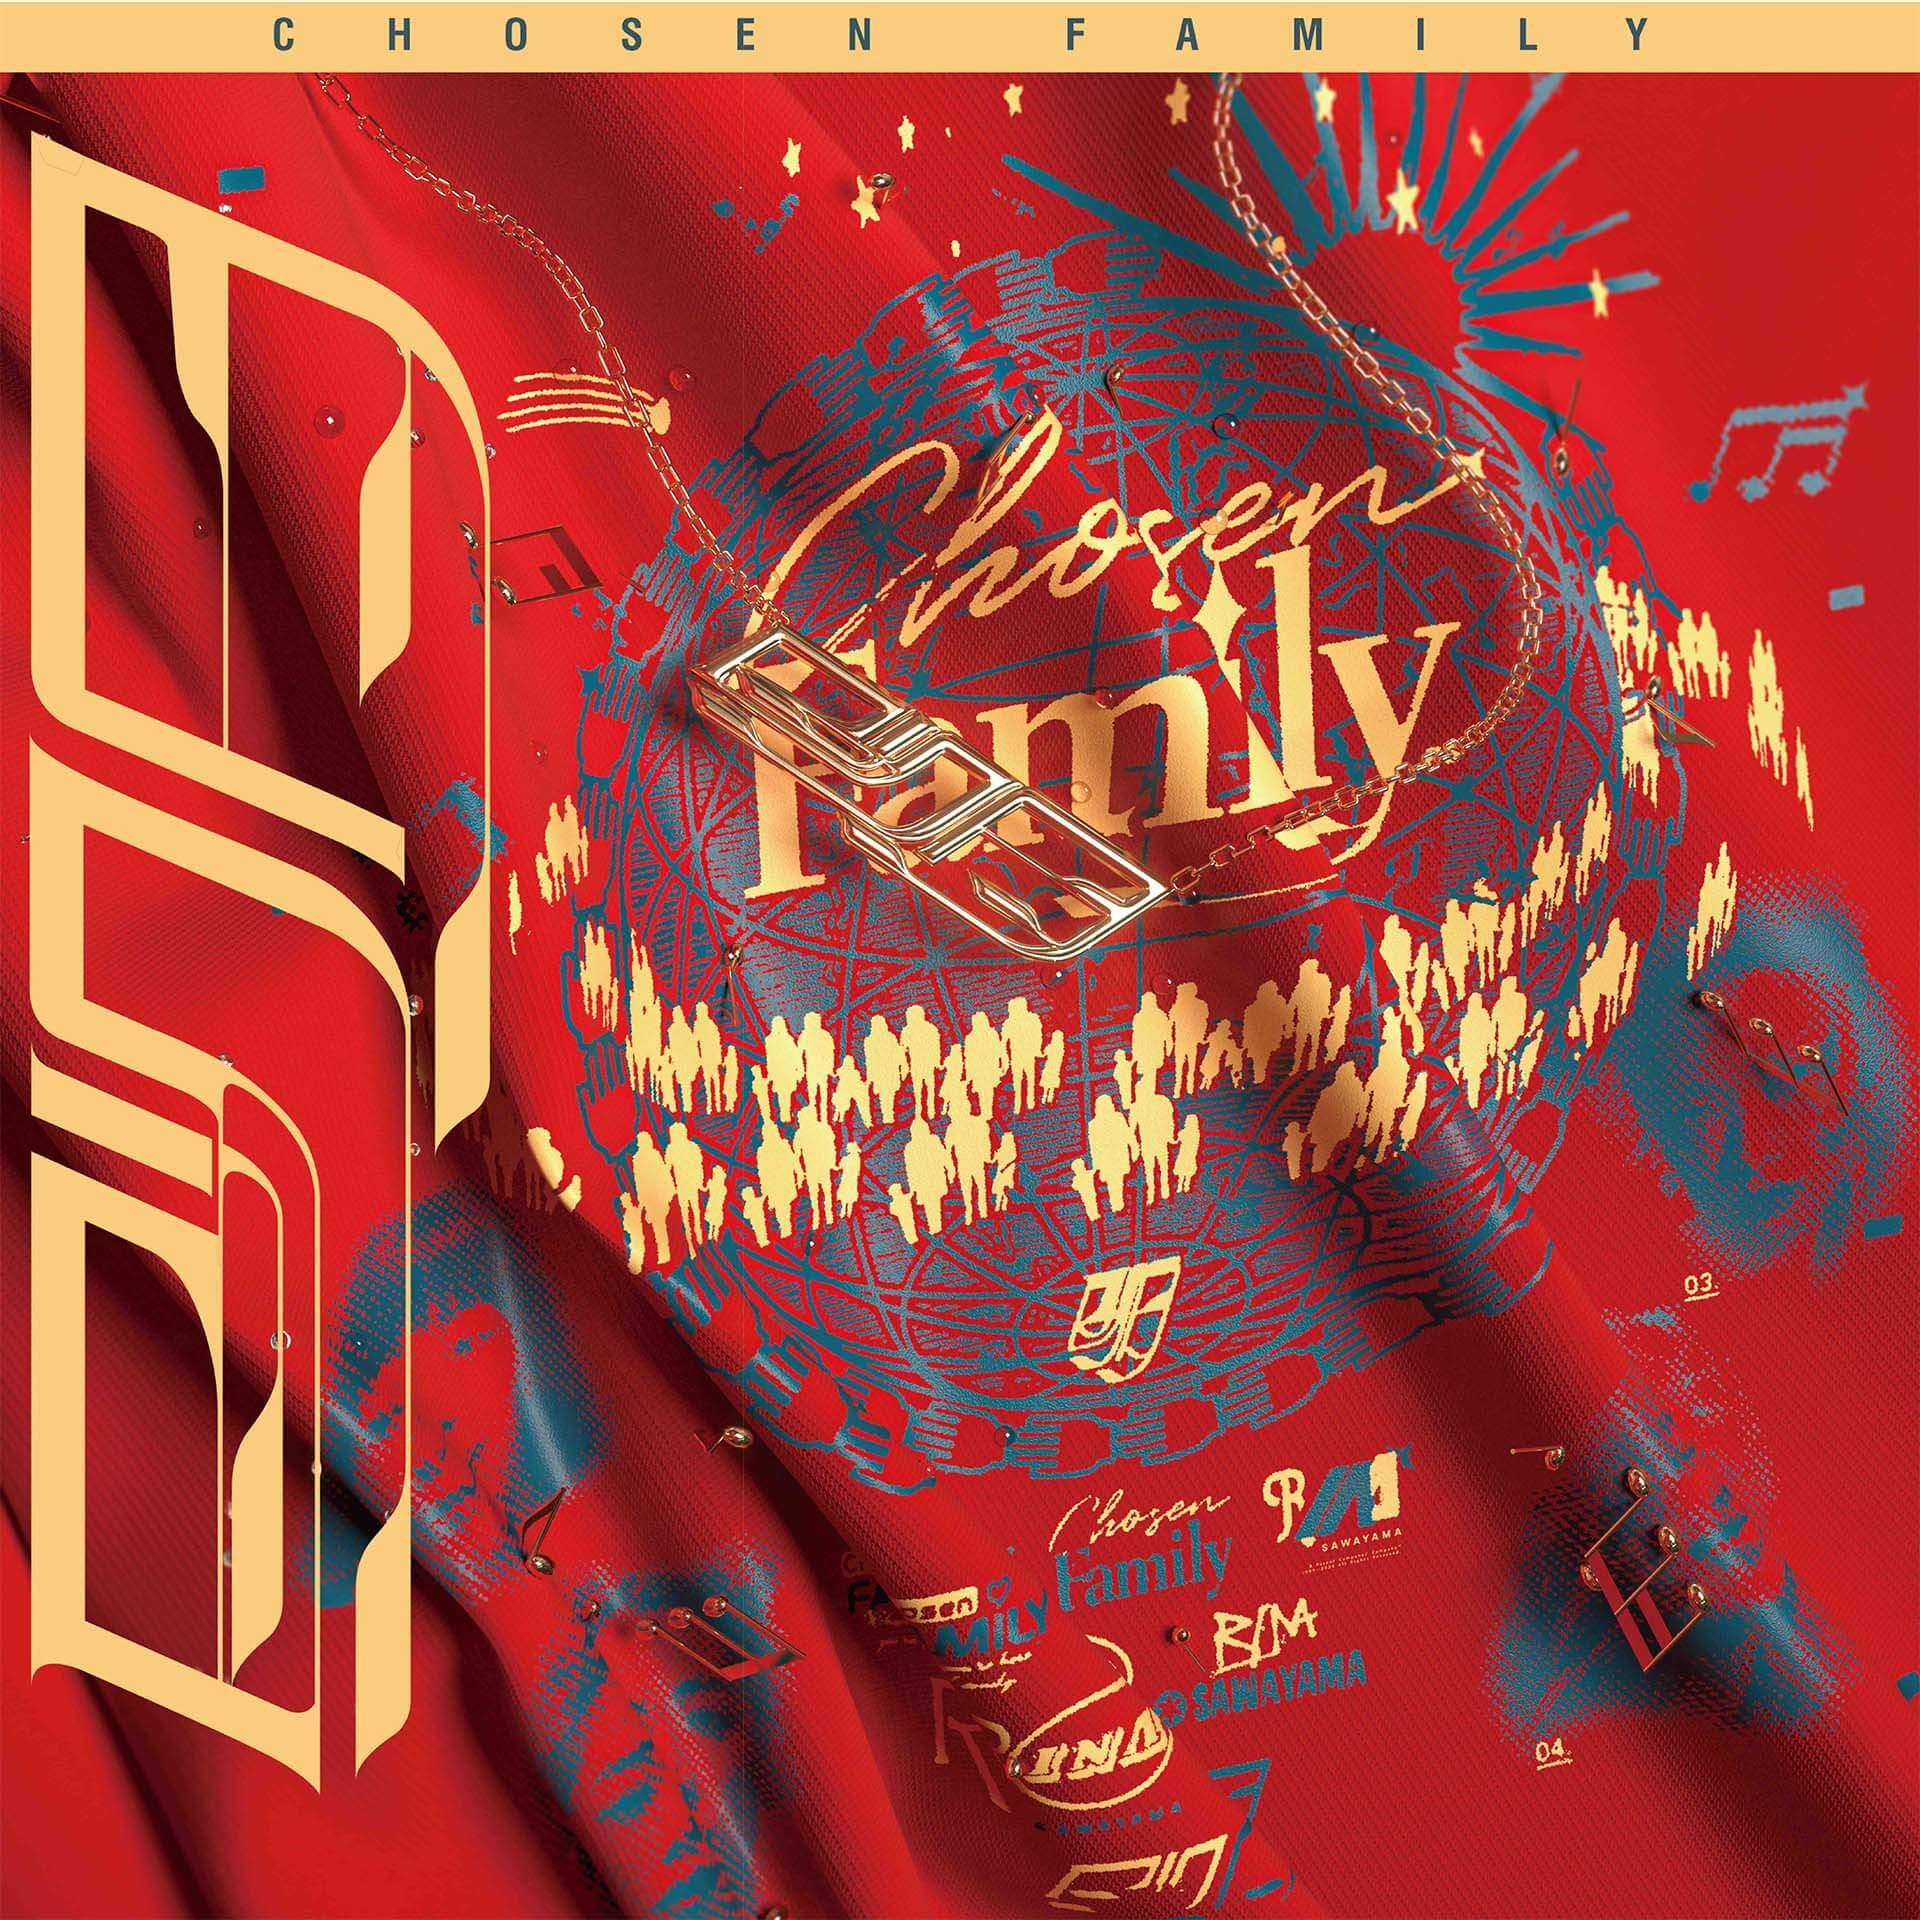 "VOGUEも注目のSSWリナ・サワヤマがデビュー・アルバム『SAWAYAMA』から新曲""Choesen Family""をリリース music200403_rinasawayama_02"